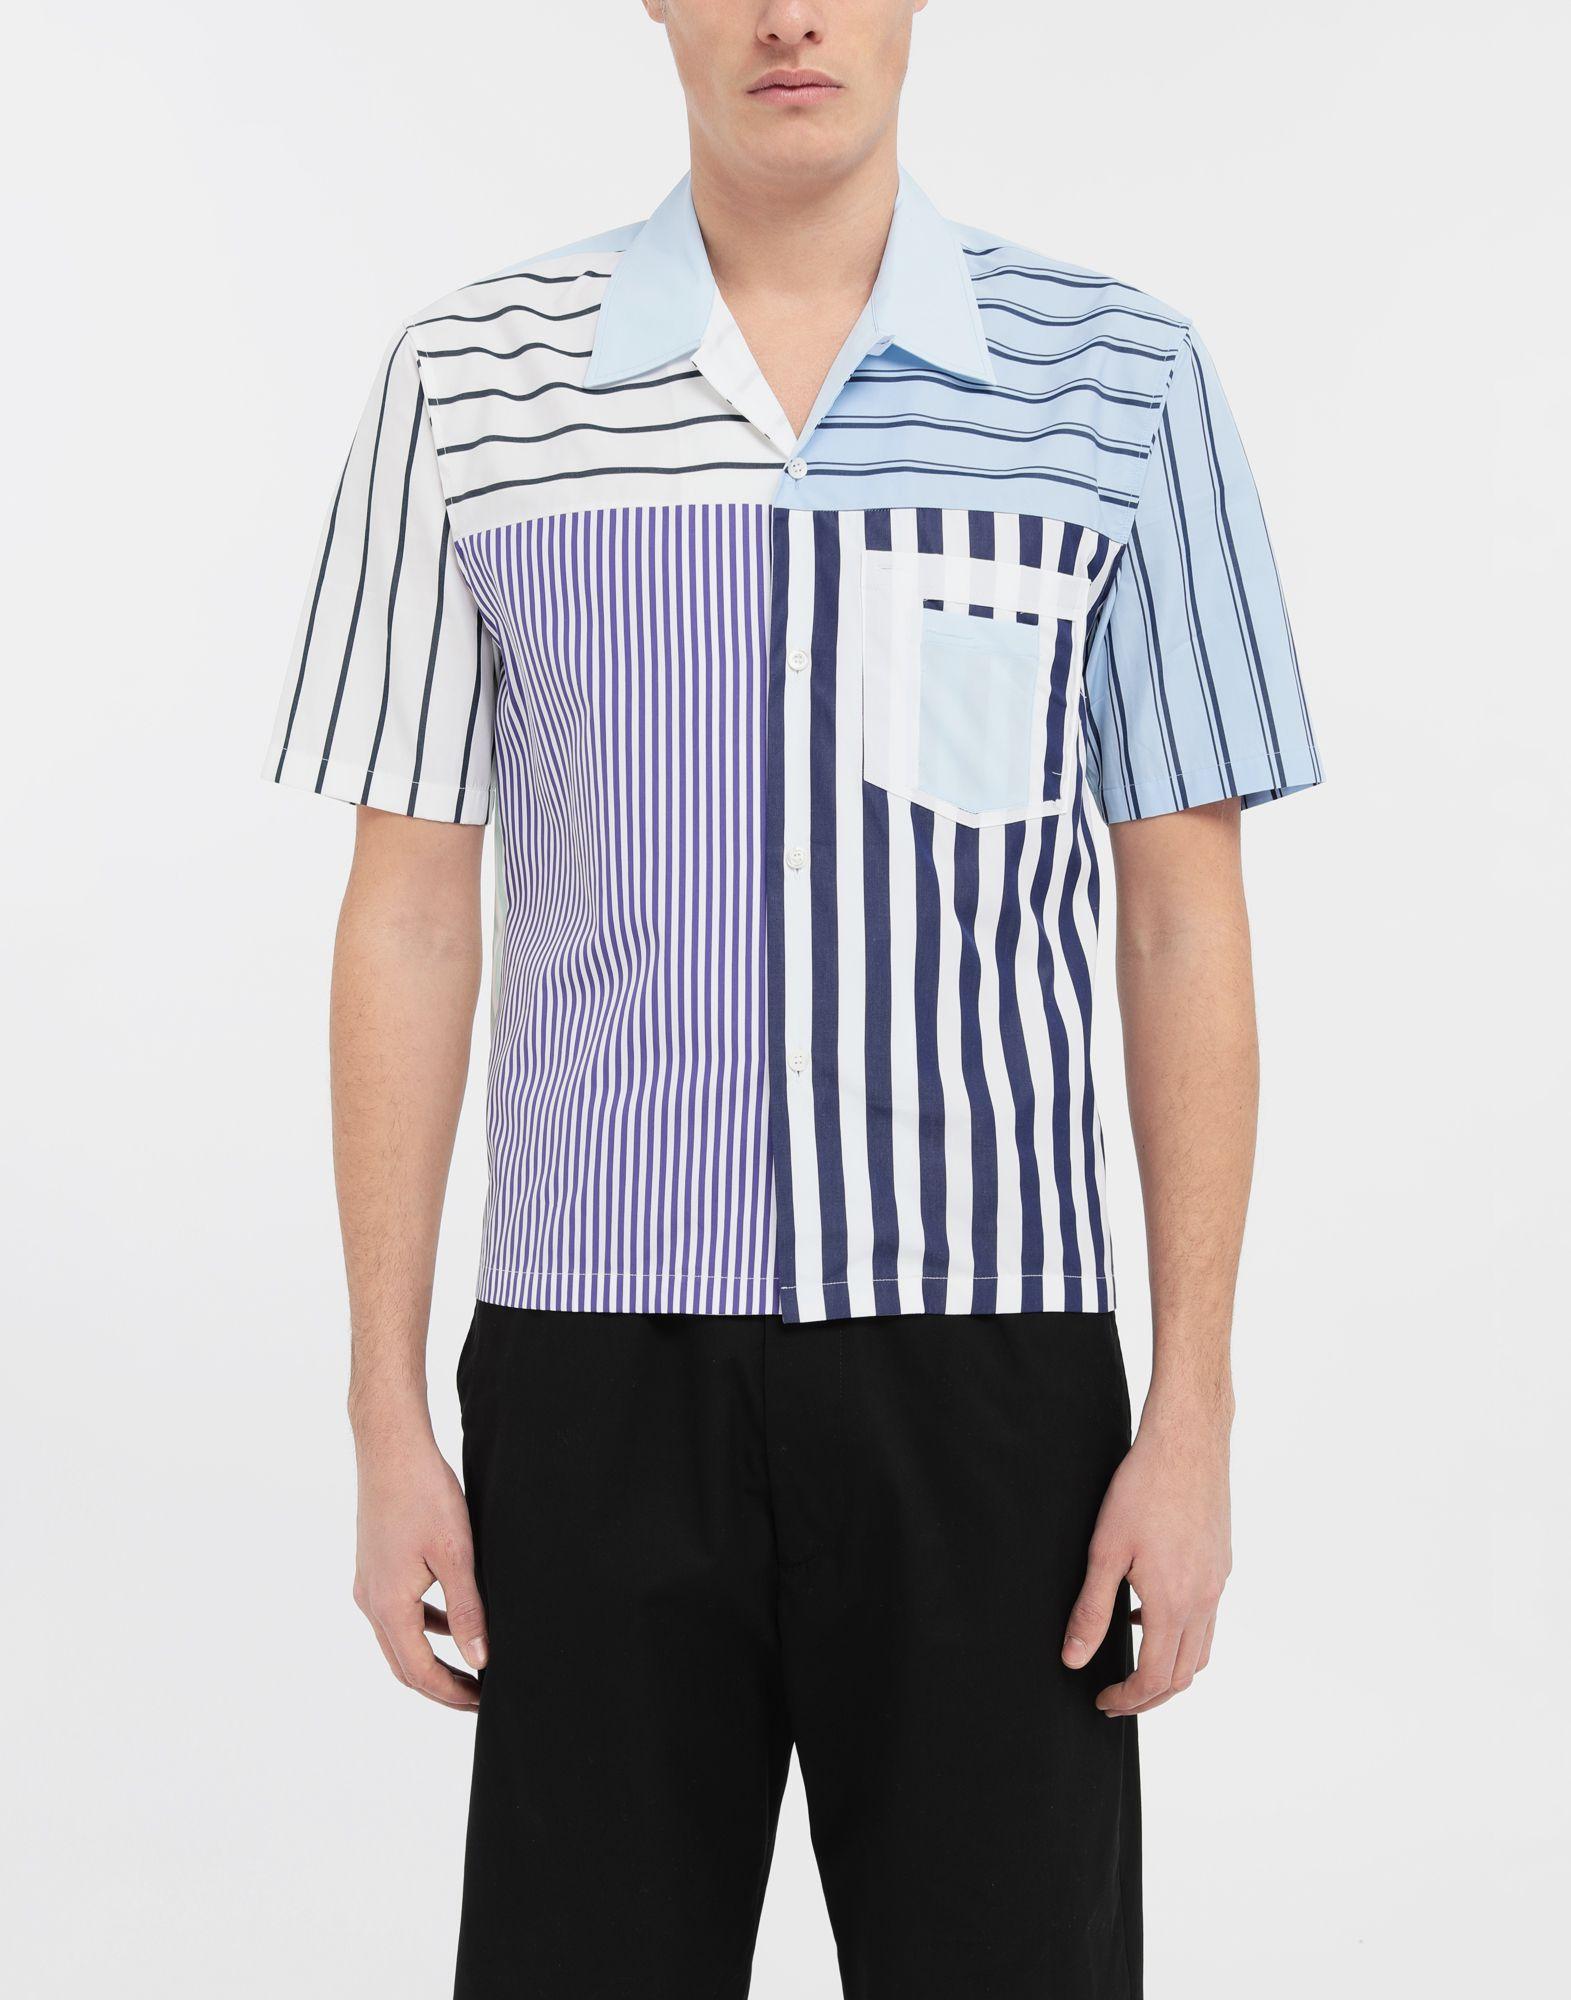 MAISON MARGIELA Asymmetric striped shirt Short sleeve shirt Man r